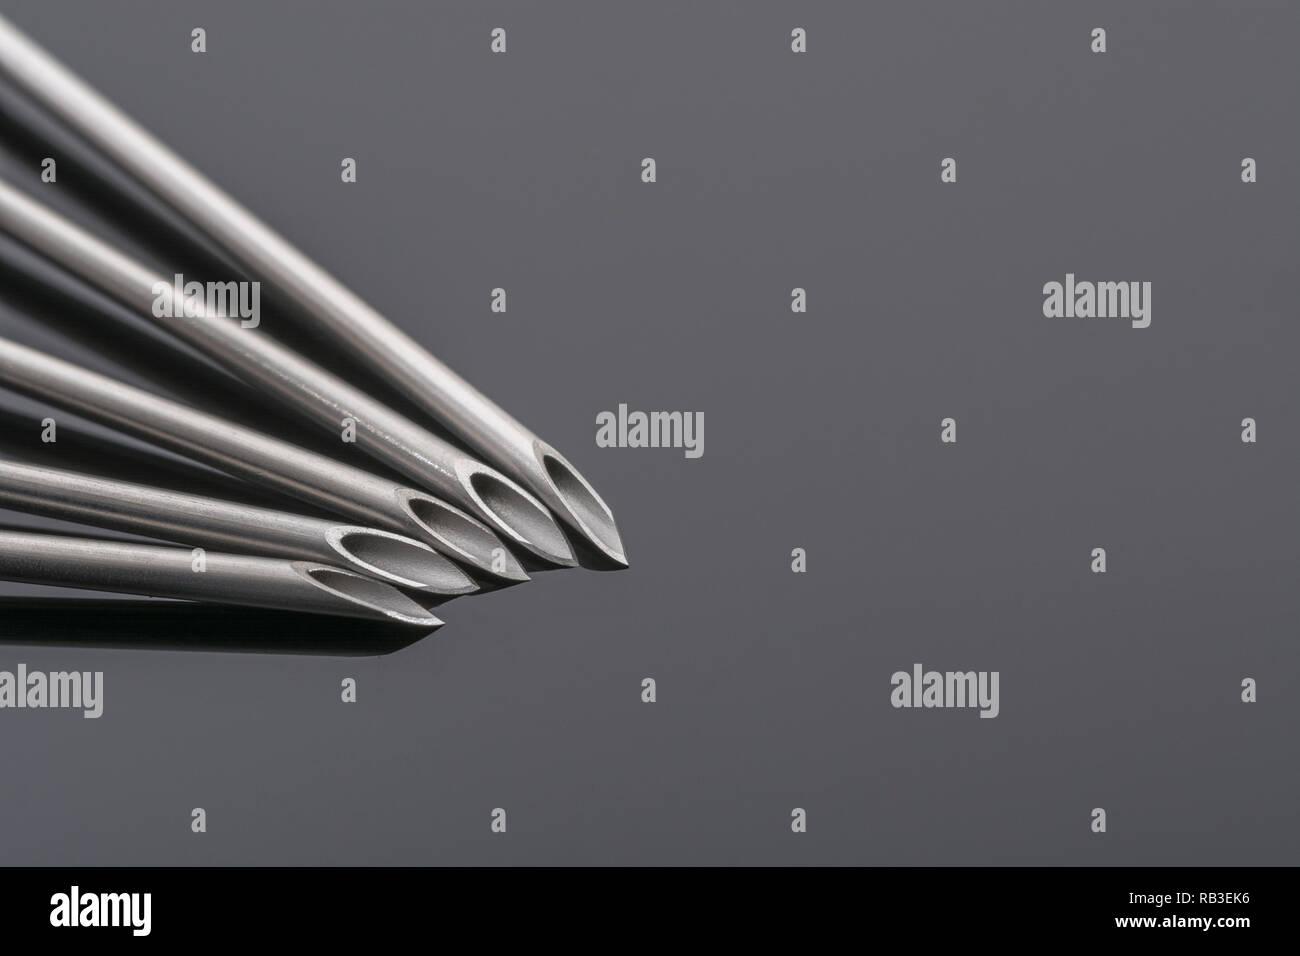 Macro close-up hypodermic needle tips. BD Microlance 18 Gauge 1 1/2' 1.2/40mm Pink. Metaphor NHS, innoculation, flu jab, sharp point, abstract needle. - Stock Image